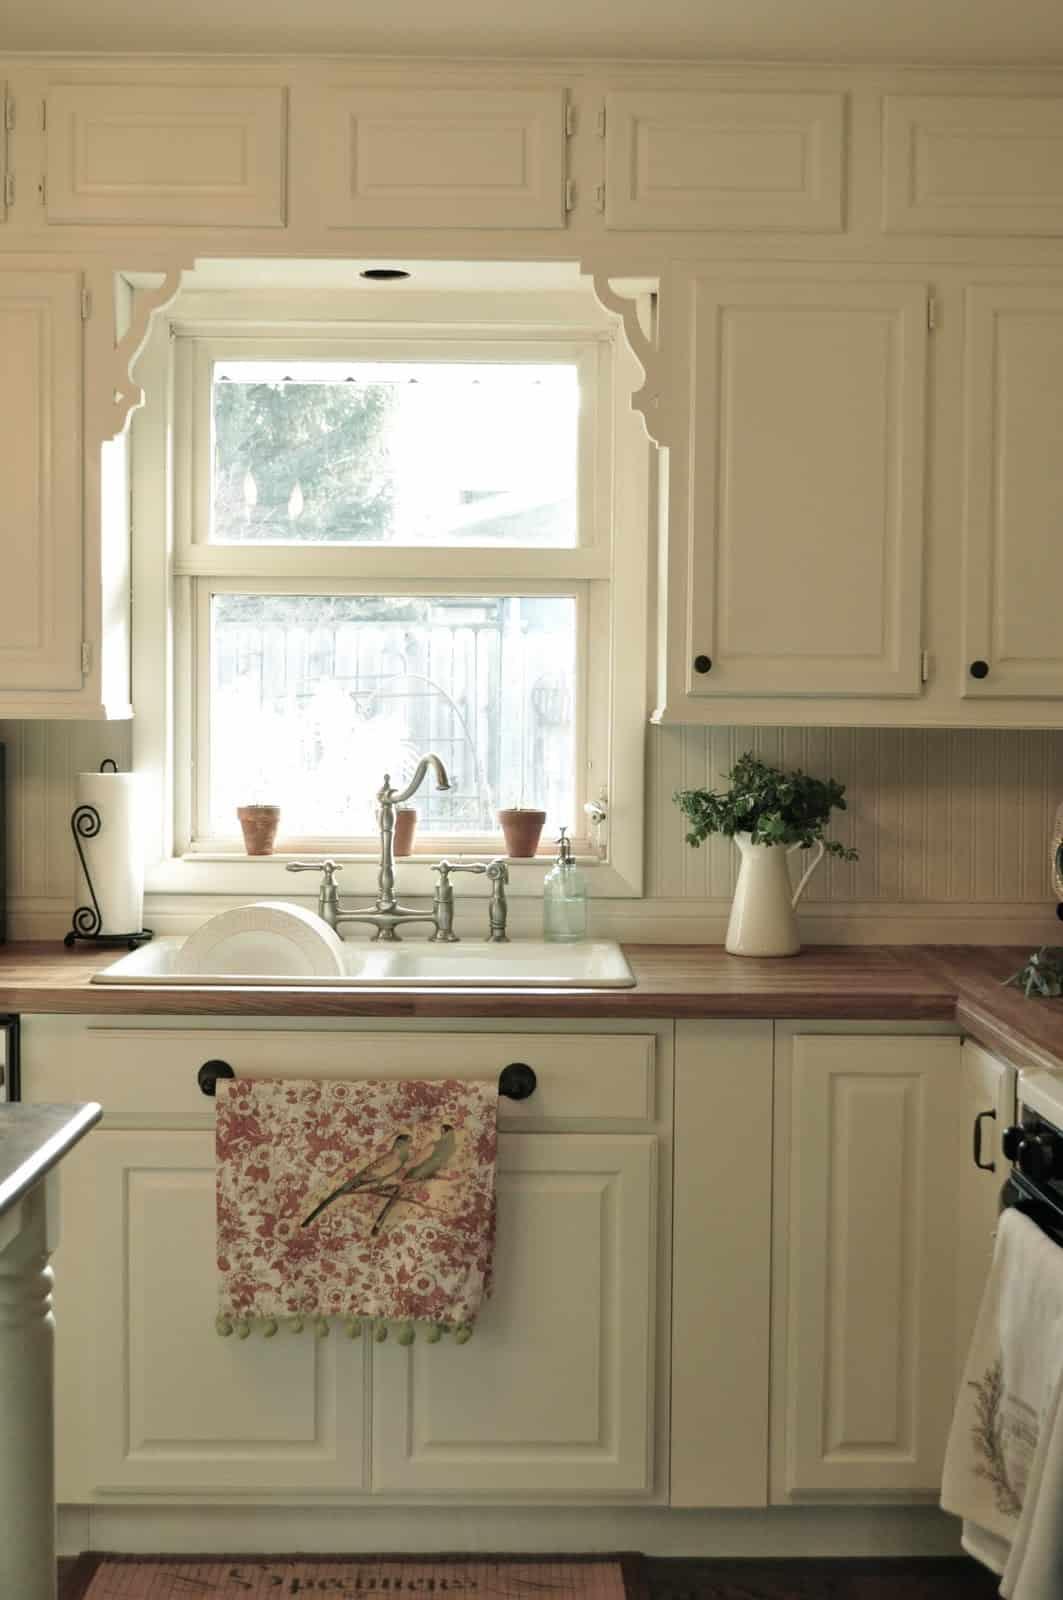 Beautiful #827349 Blogs I Love} Jennifer Rizzo Celebrating Everyday Life With Kitchen  Sink Window Trim